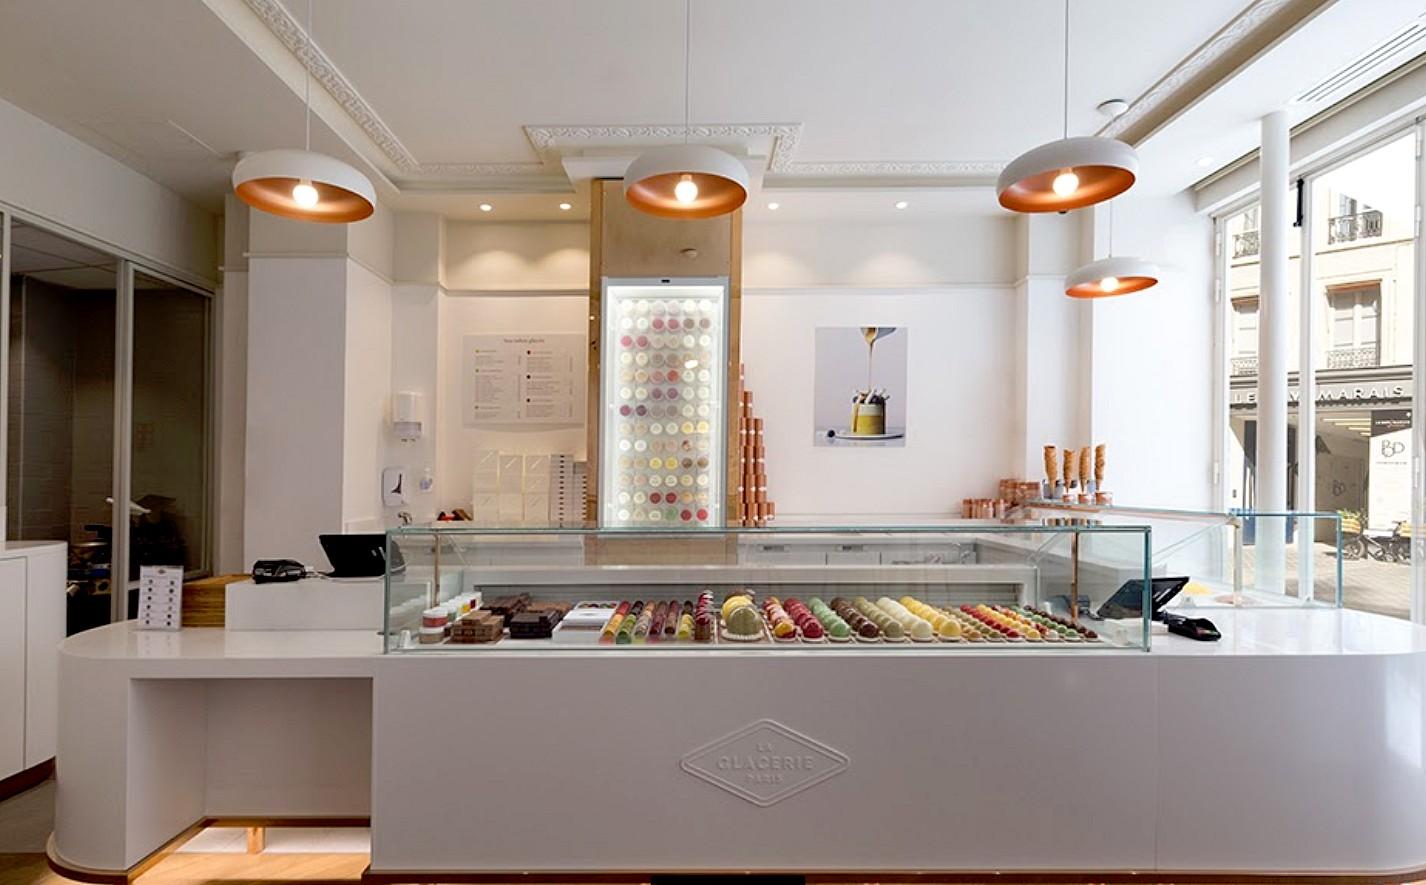 la Boutique La Glacerie ©Thierry Malry